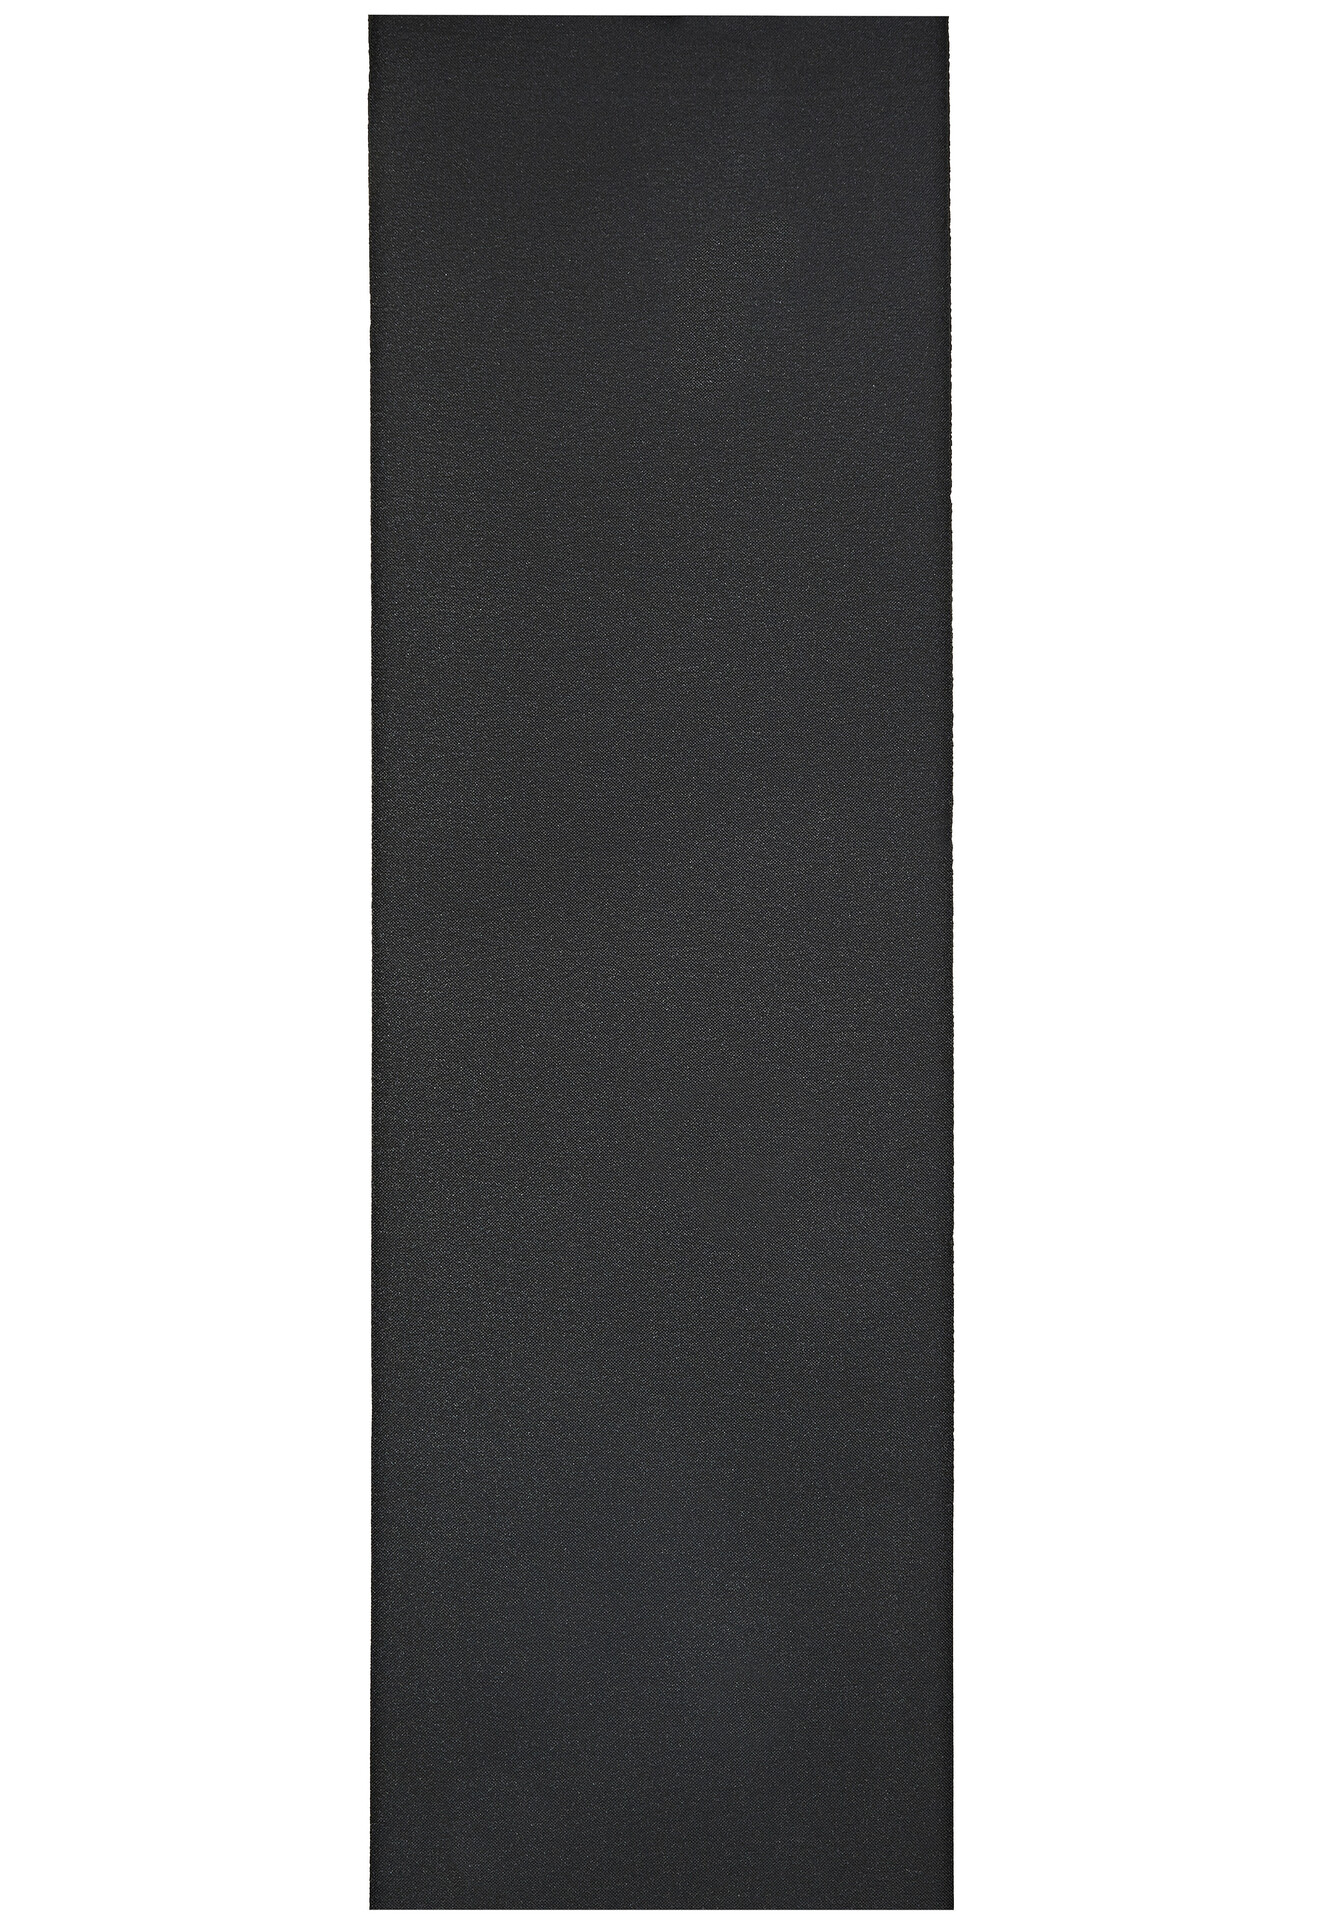 CAMPZ Isomat Isomat Isomat XL 200x55cm (2019) 7cbbef